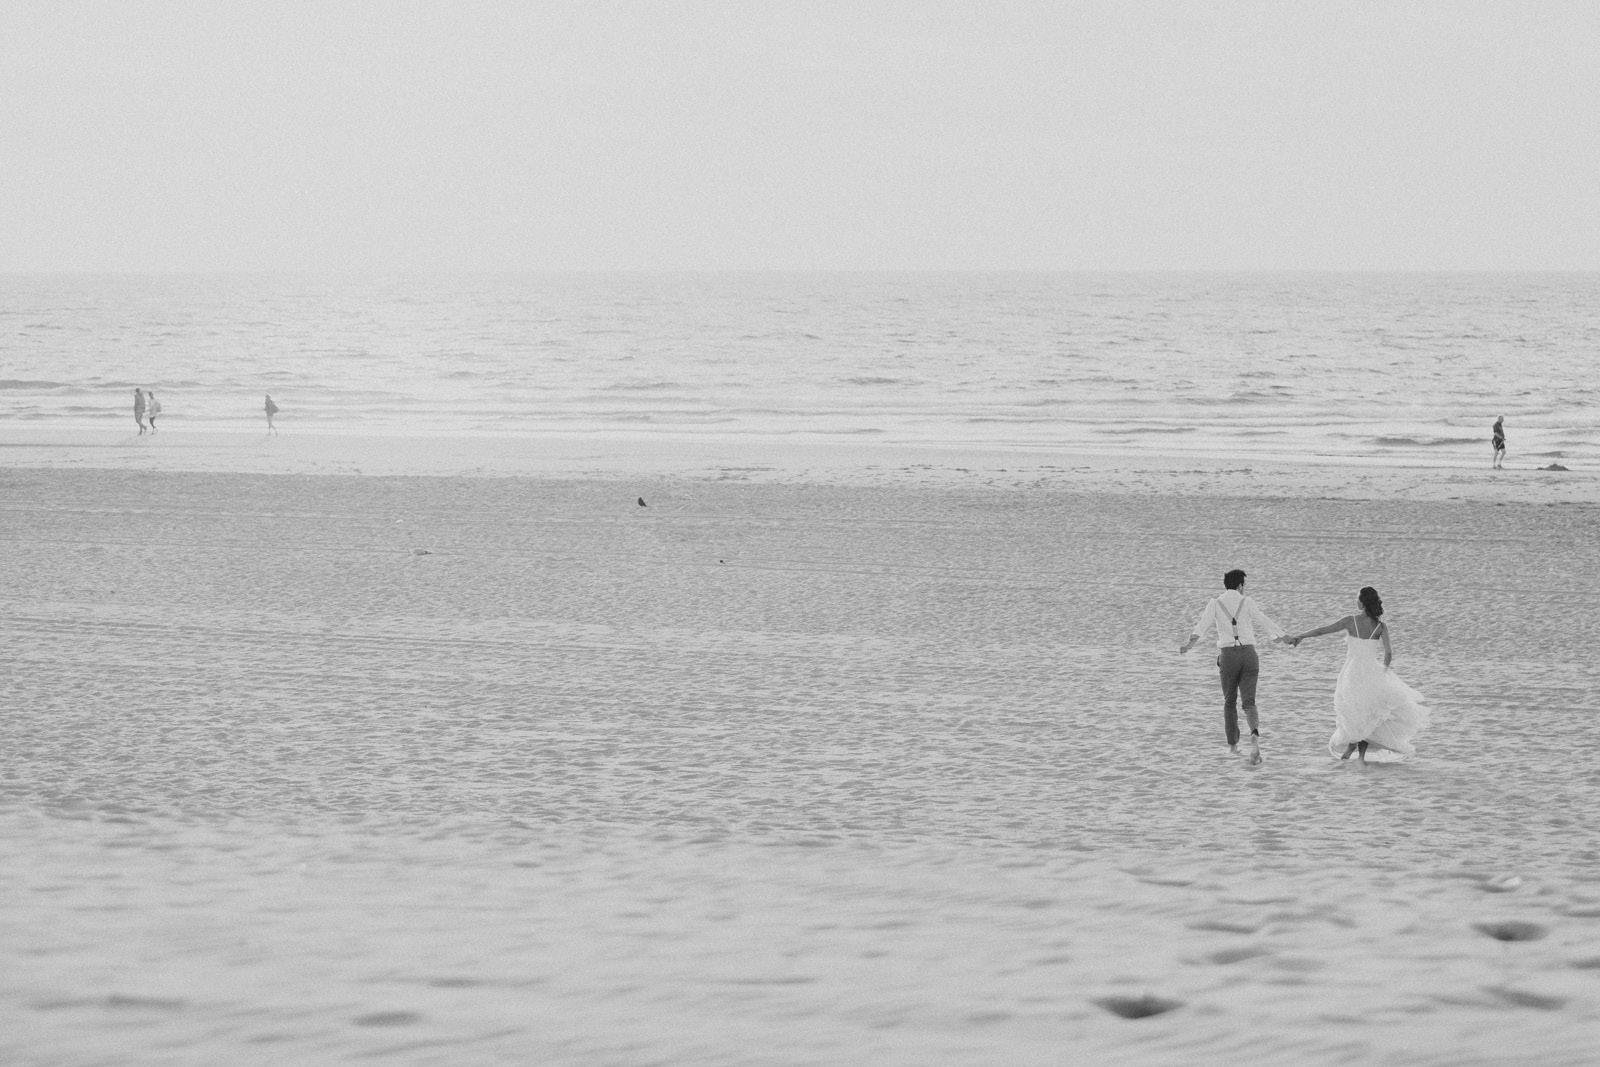 Evabloem_trouwen-sint-joris-doele_strandpaviljoen-zuid-76.jpg